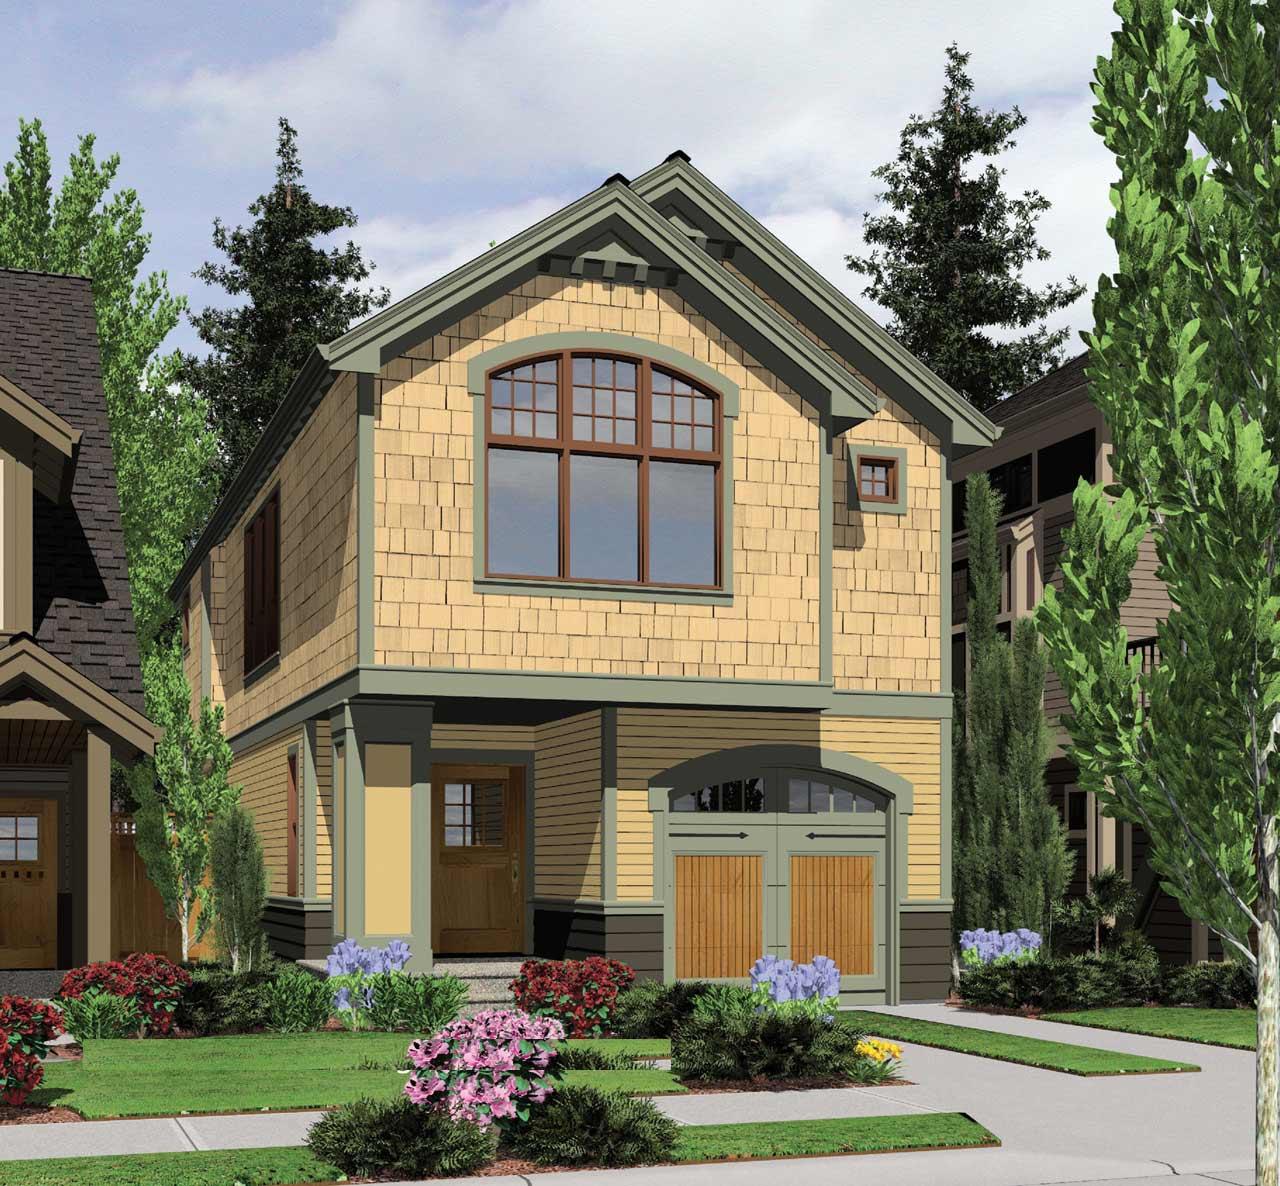 Craftsman Style Home Design Plan: 74-284